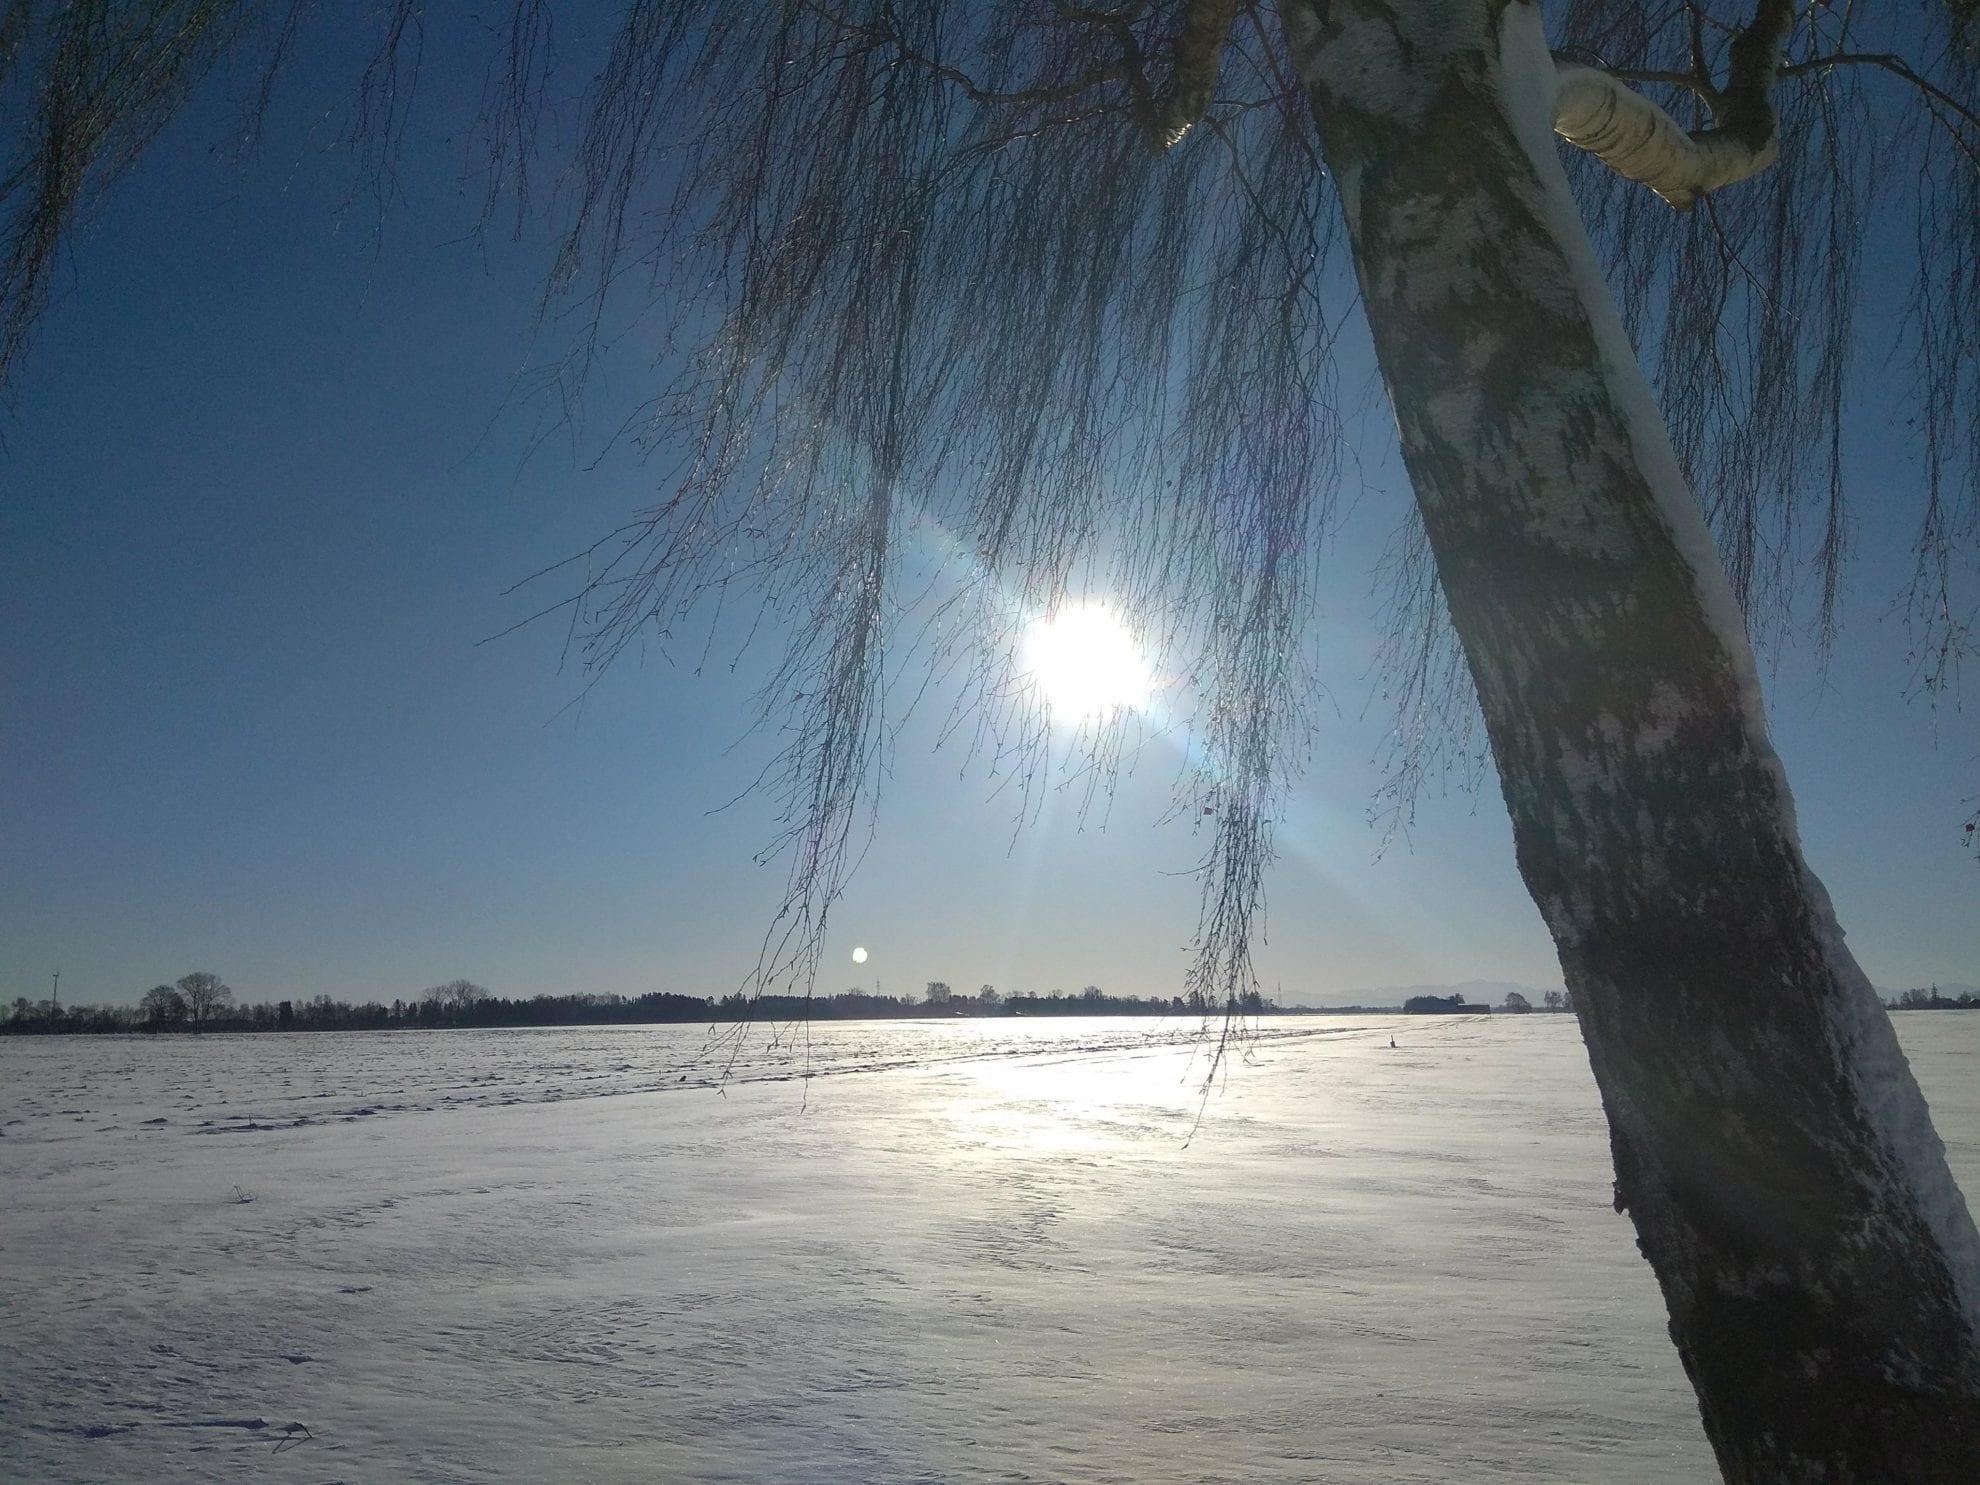 Allgäu, Winter, Sonne, Schnee, Puddingklecks, Bayern